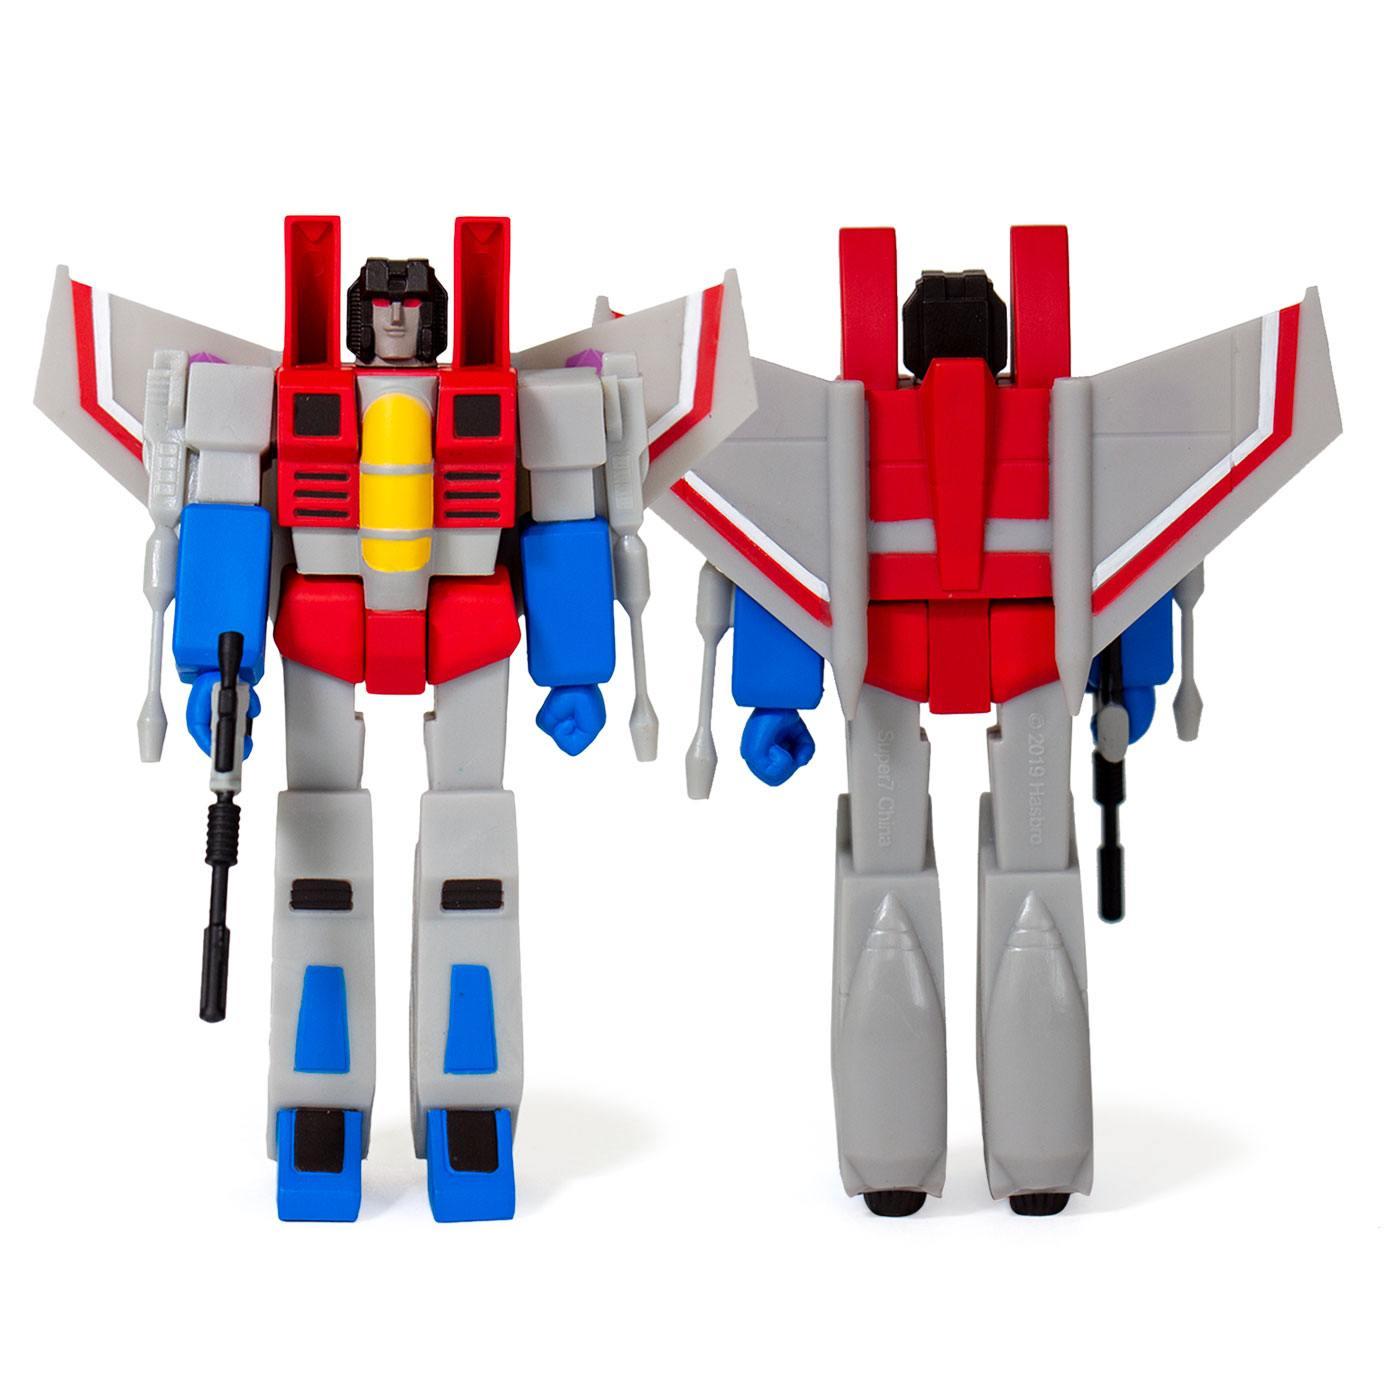 Transformers ReAction Action Figure Wave 1 Starscream 10 cm